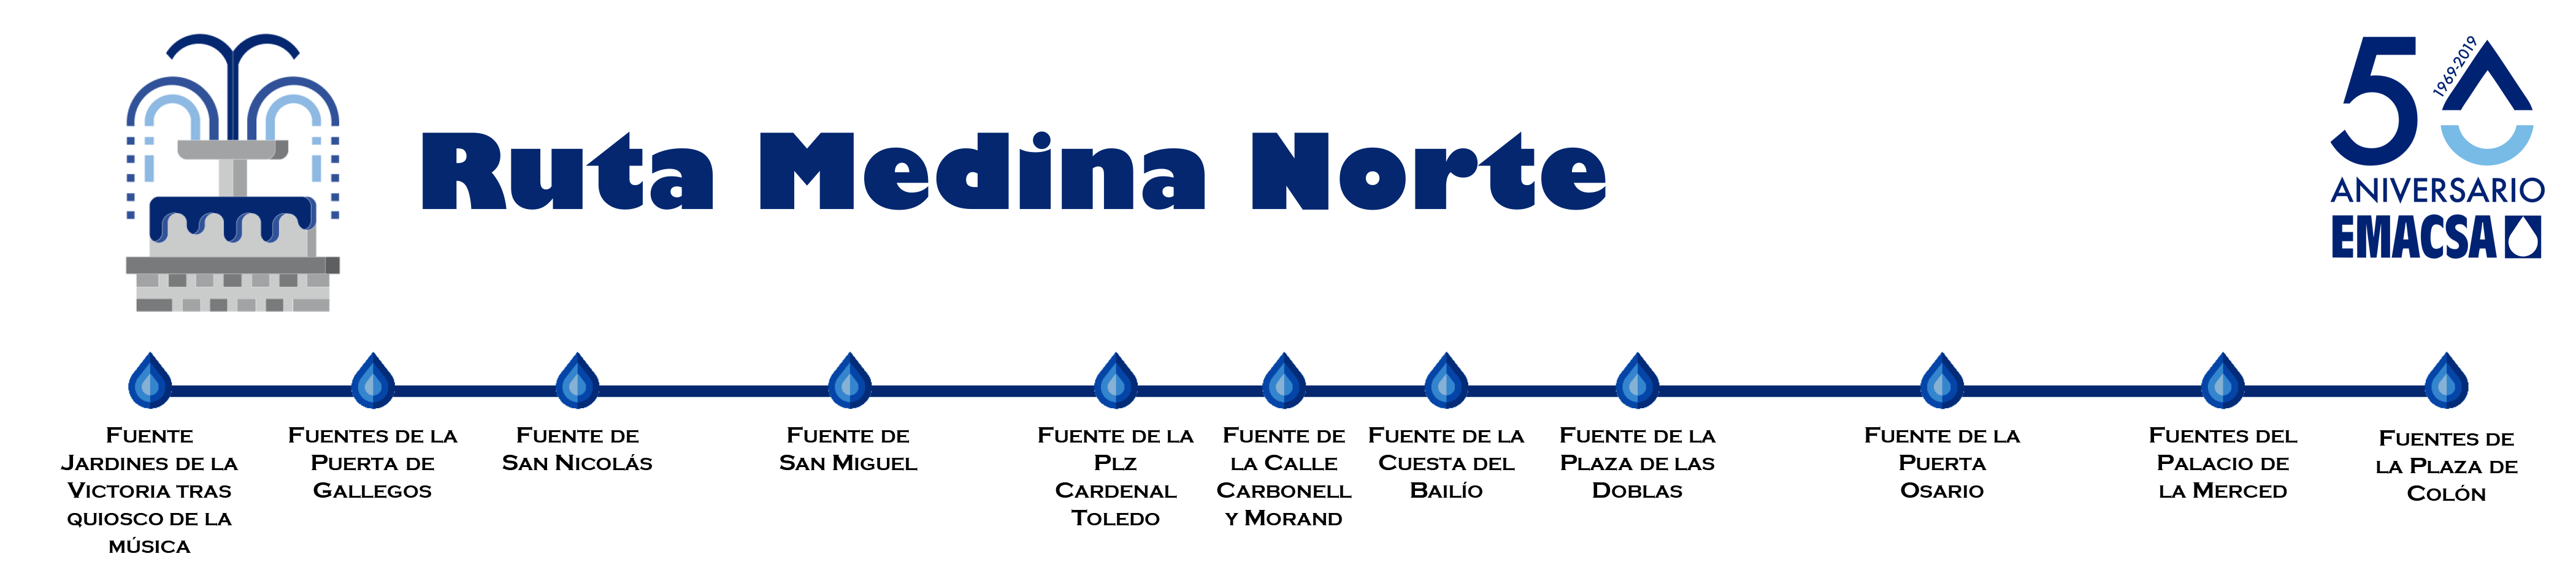 Itinerario ruta medina norte